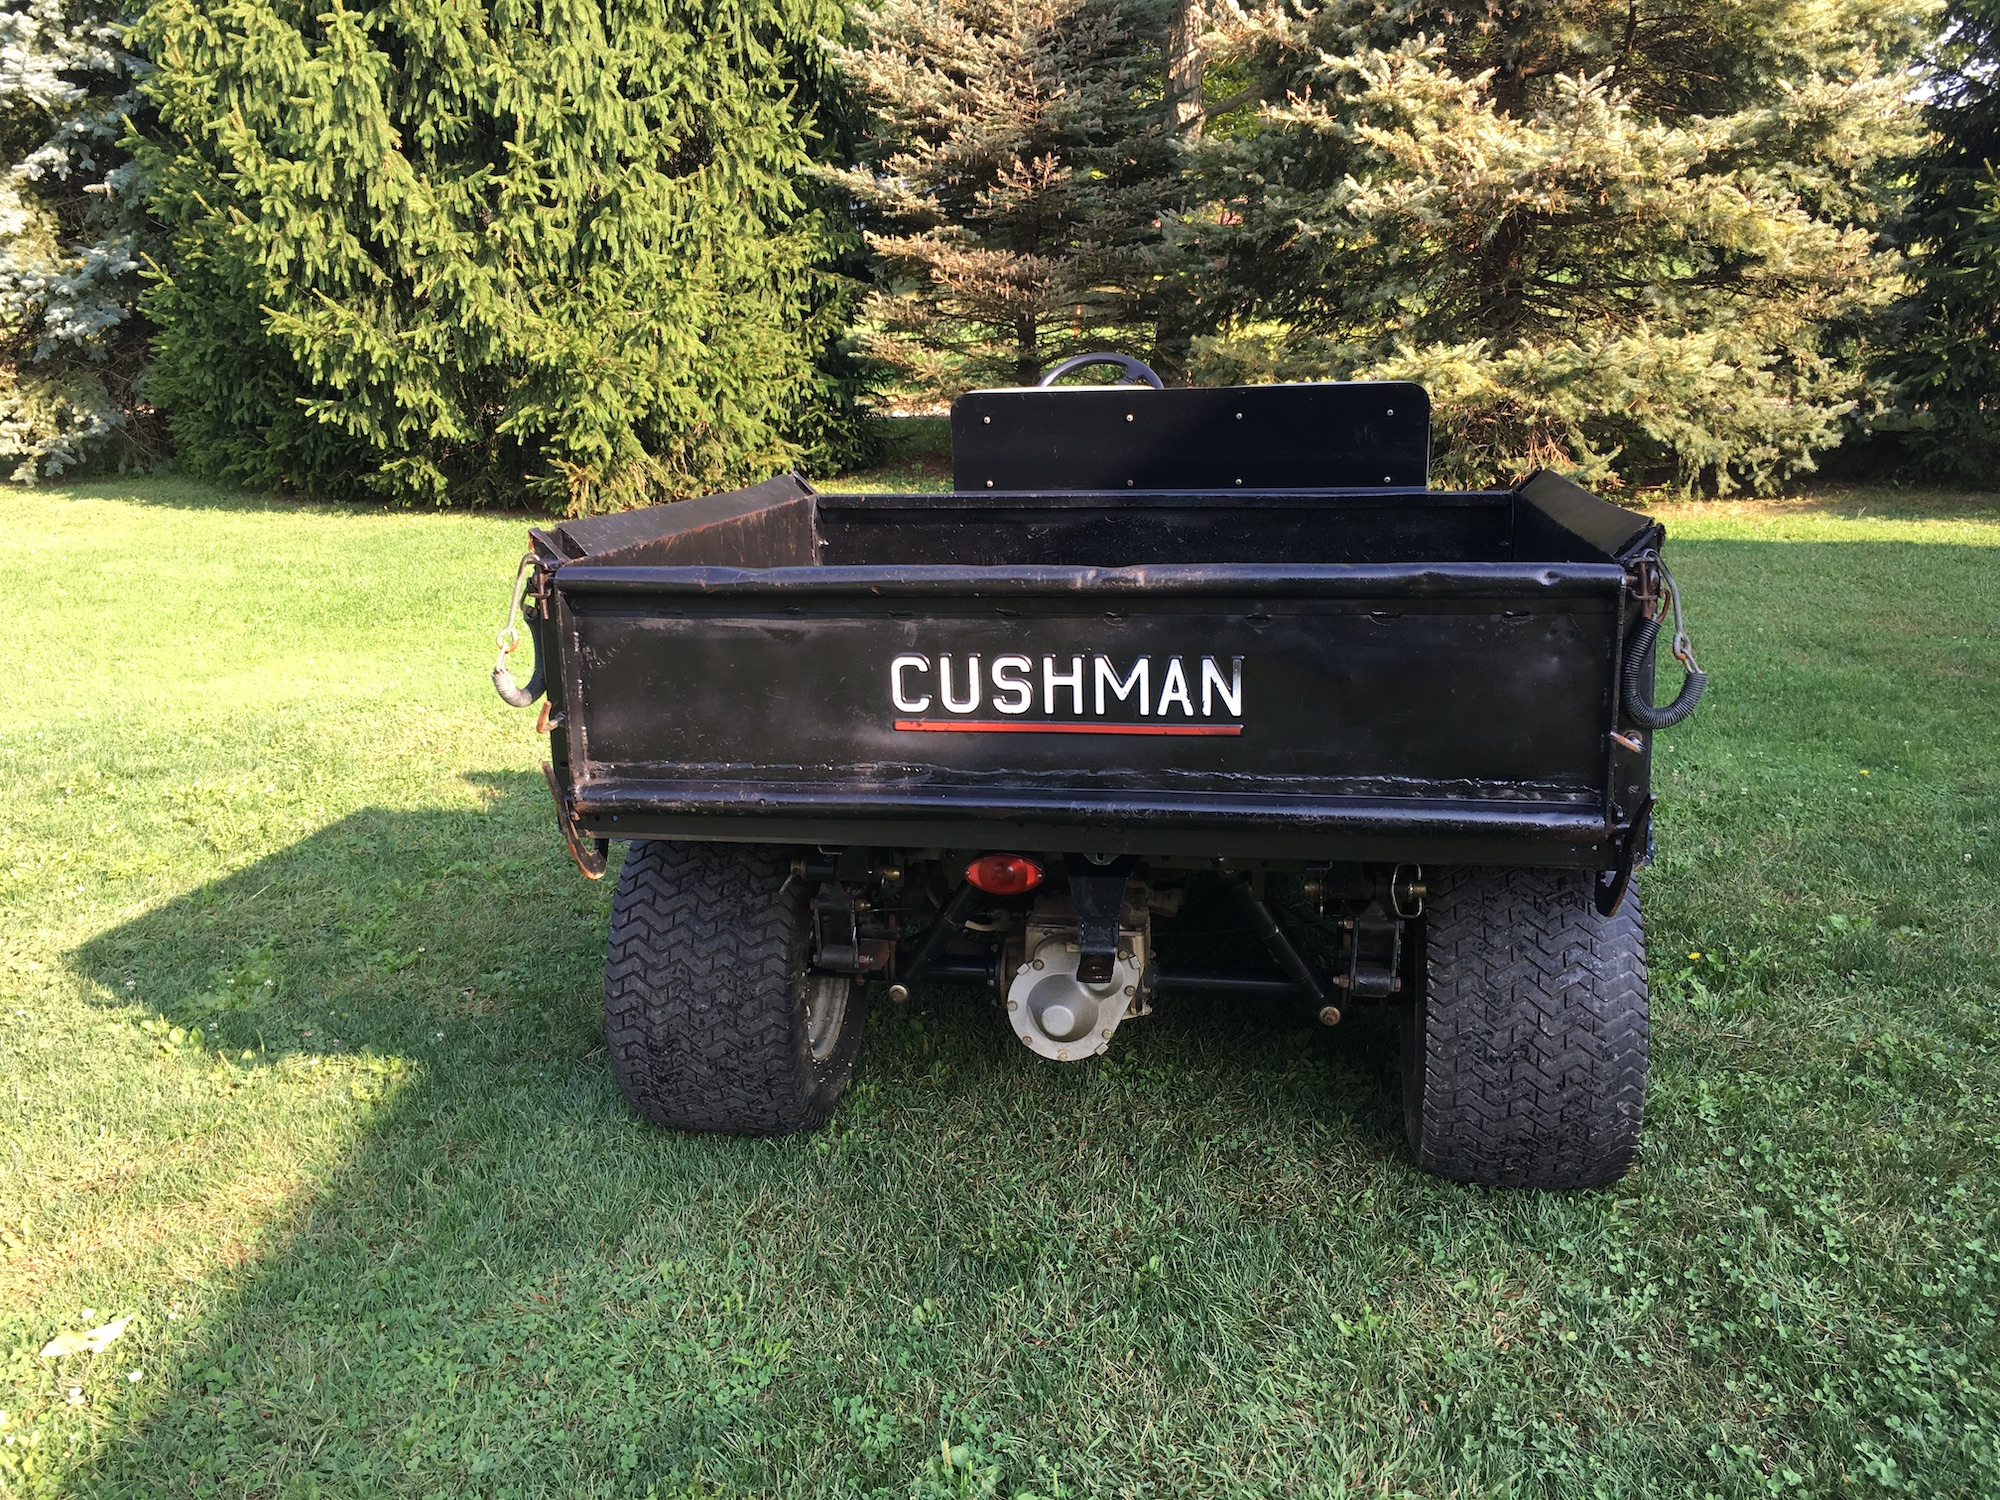 Cushman-S660-Truckster-04